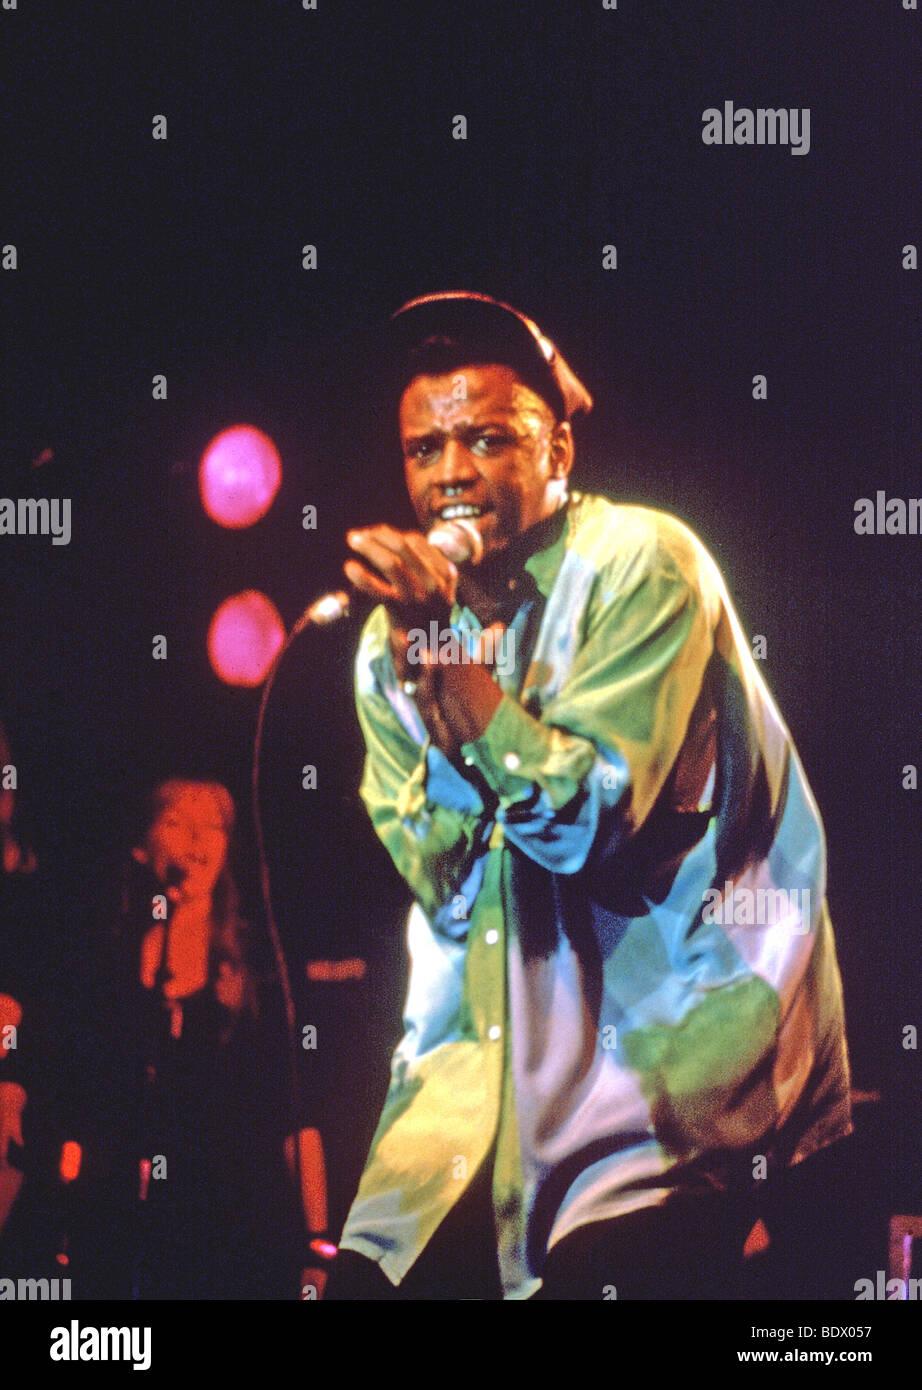 DAVID GRANT - UK-Sängerin im Jahr 1983 Stockbild